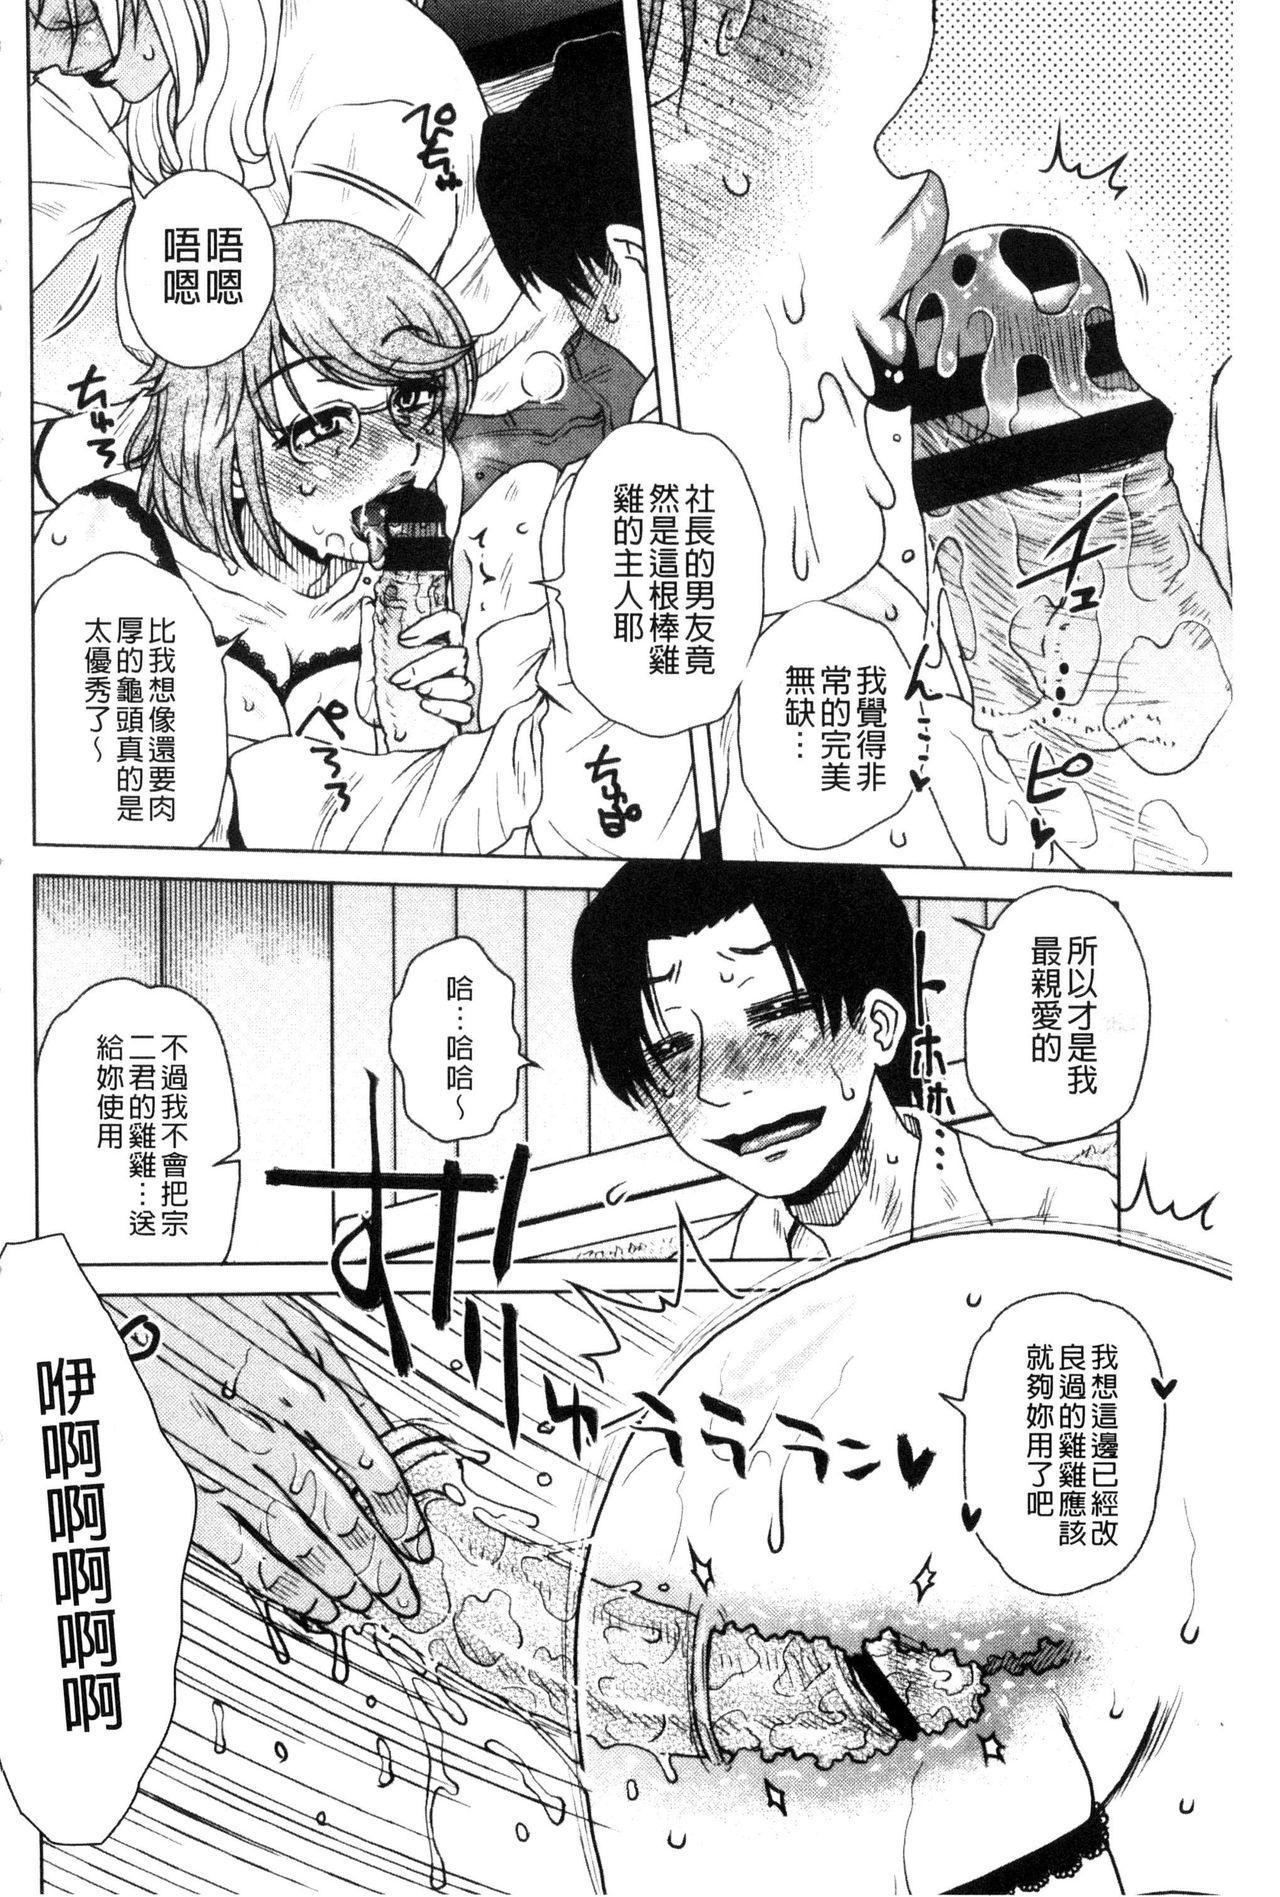 [Kurumiya Mashimin] Uchi no Shachou no Hamedere Inkatsu - Our President is HAME-DERE in Licentious sex life. [Chinese] 38